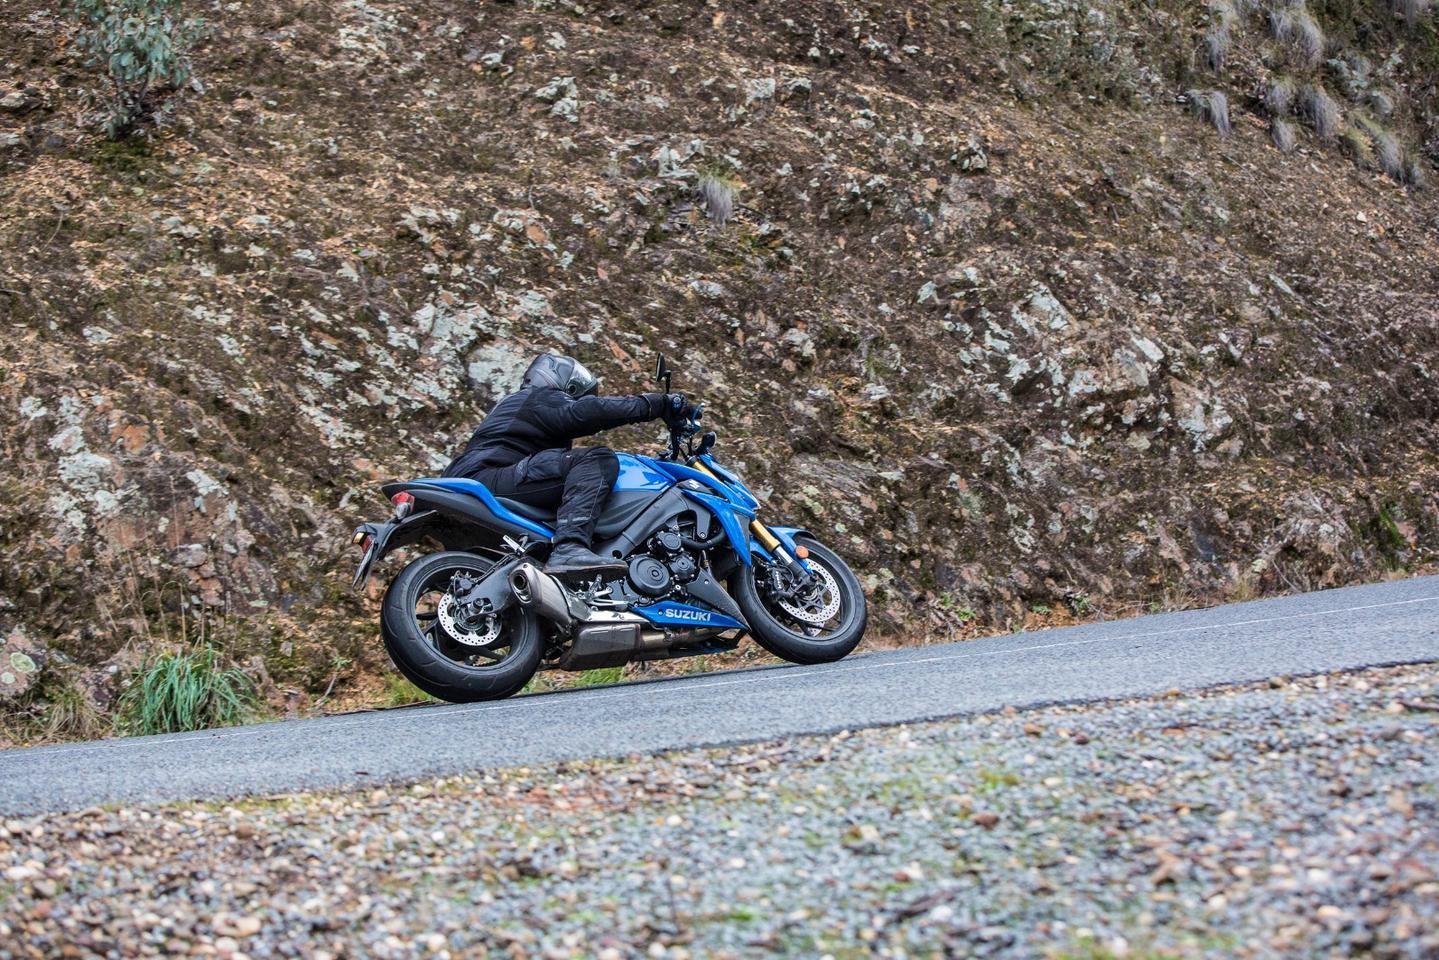 Suzuki GSX-S1000:a rev-hungry superbike for the street